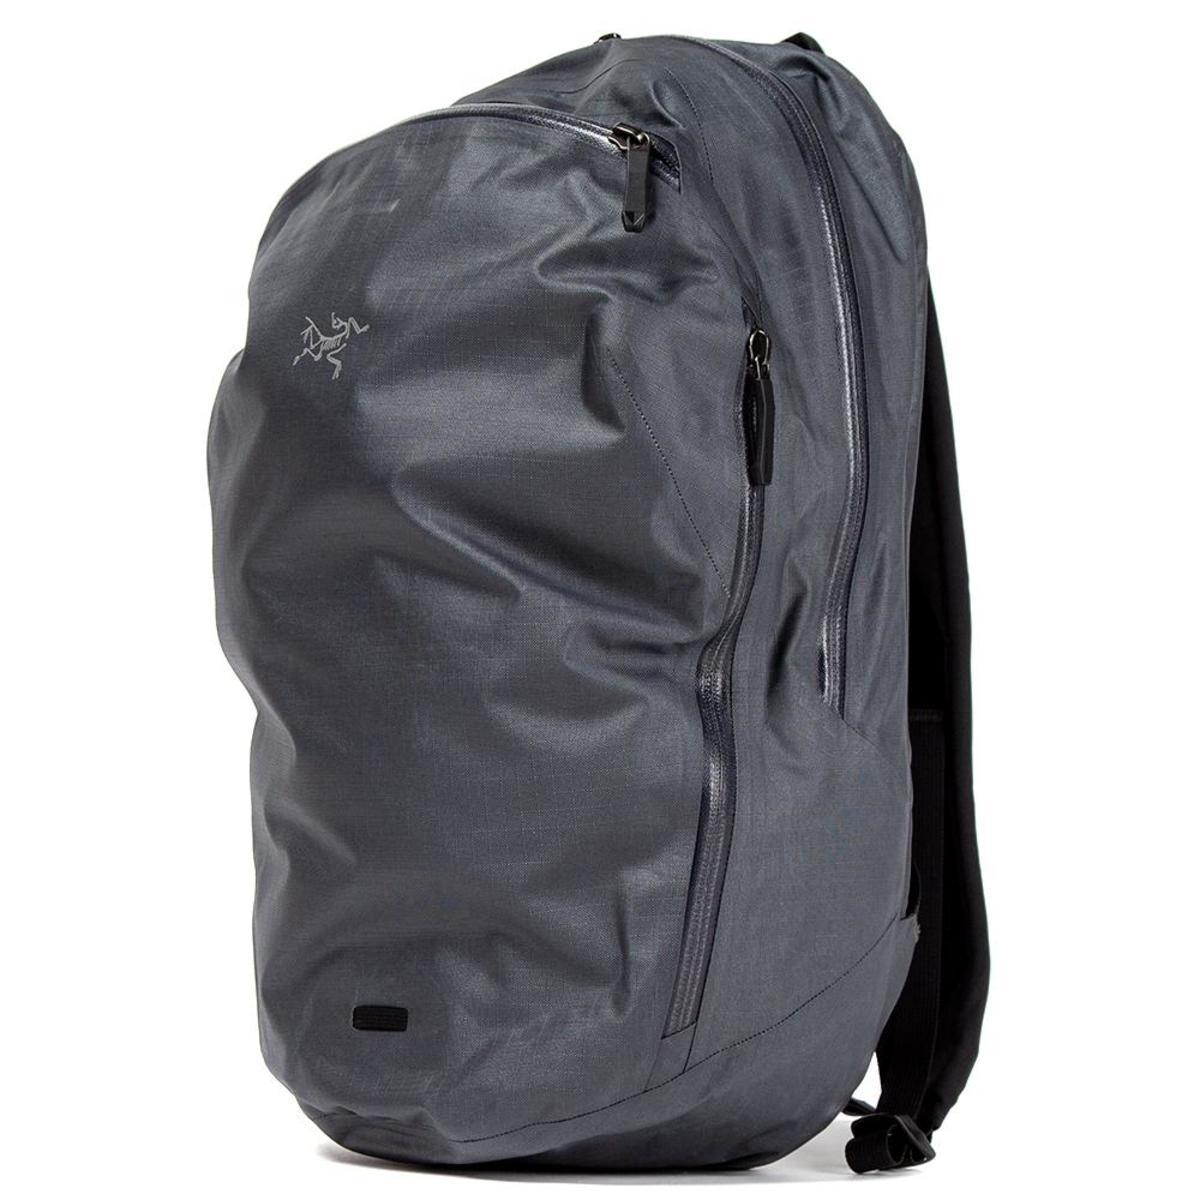 7dede22bdb6 Arc'teryx Granville Zip 16 Backpack / Pilot | Garmentory